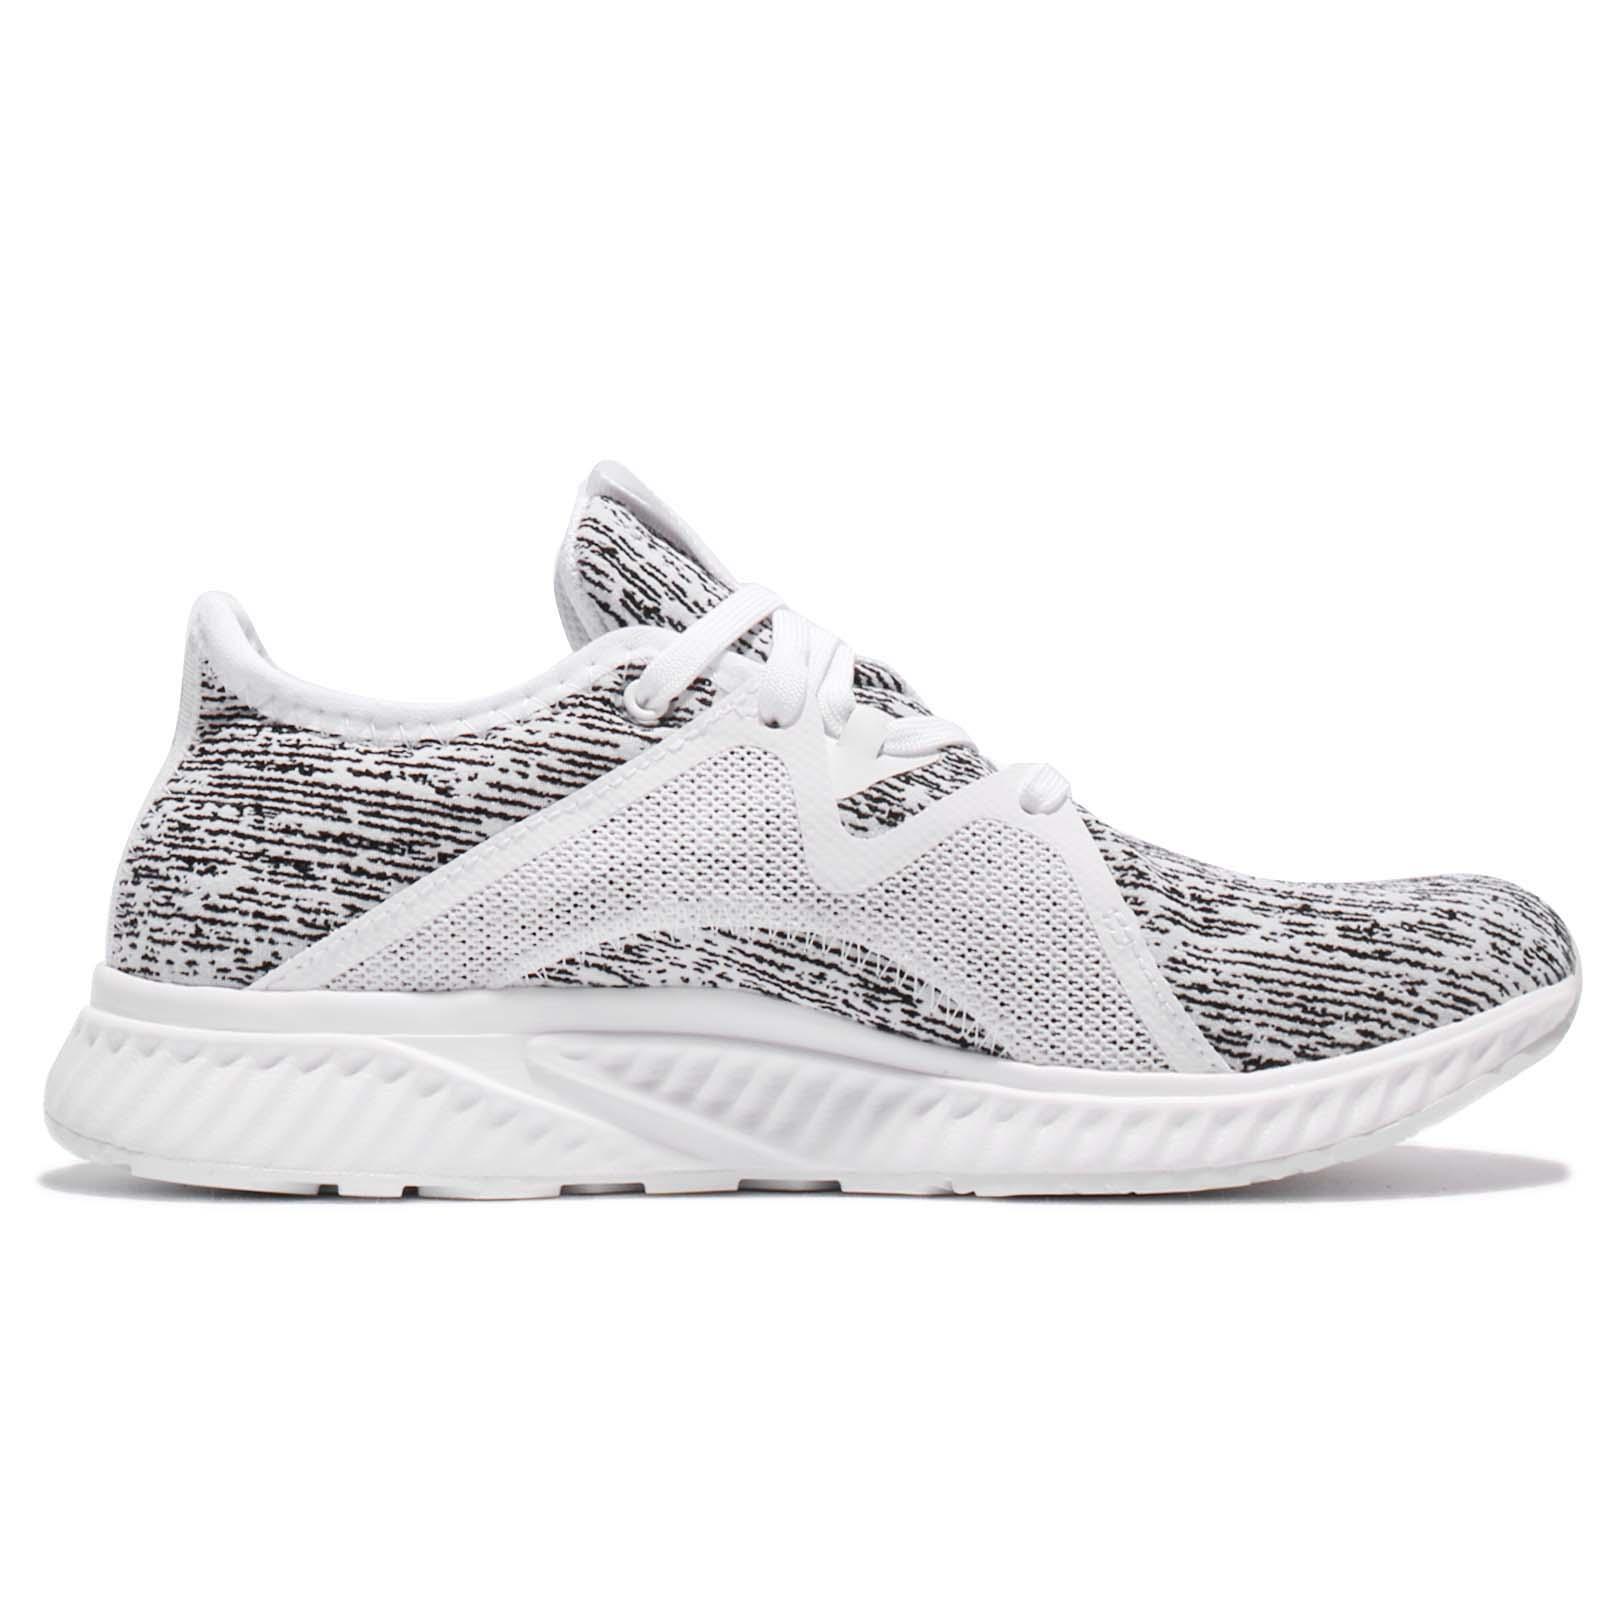 e51e1dd3897 adidas Edge Lux 2 II White Black Women Running Shoes Sneakers ...